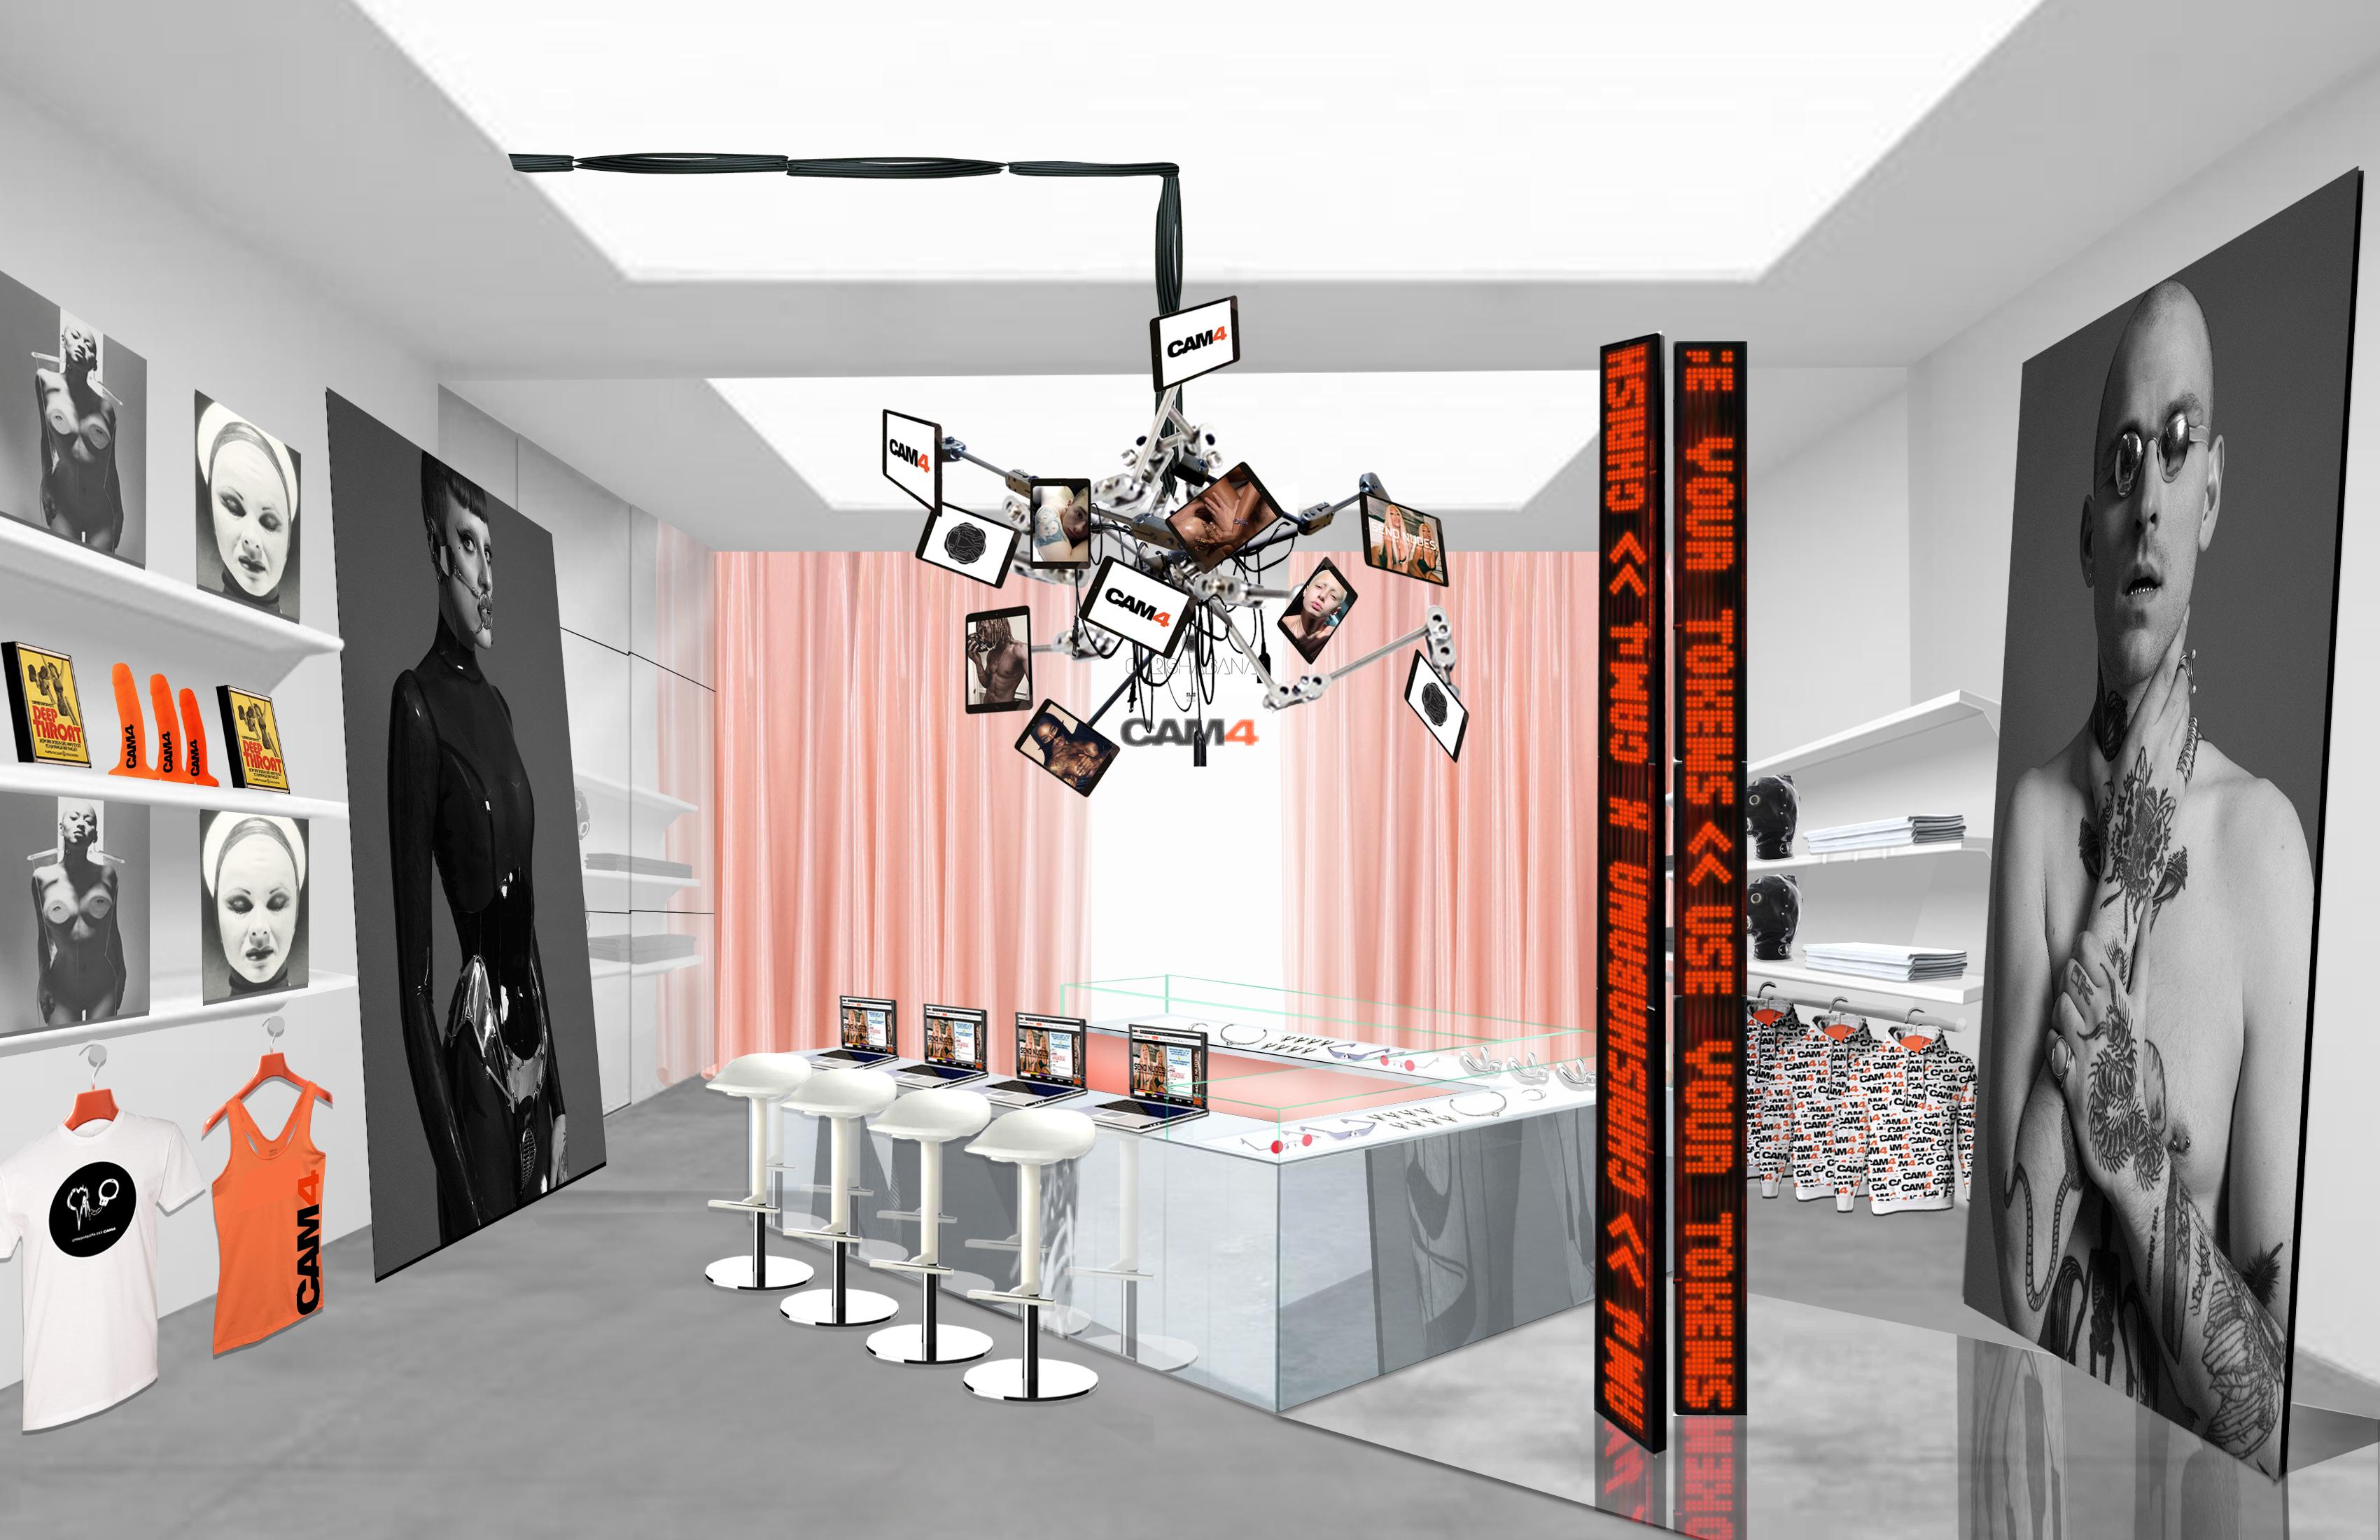 A rendering of Chrishabana XXX Cam4's pop-up shop.